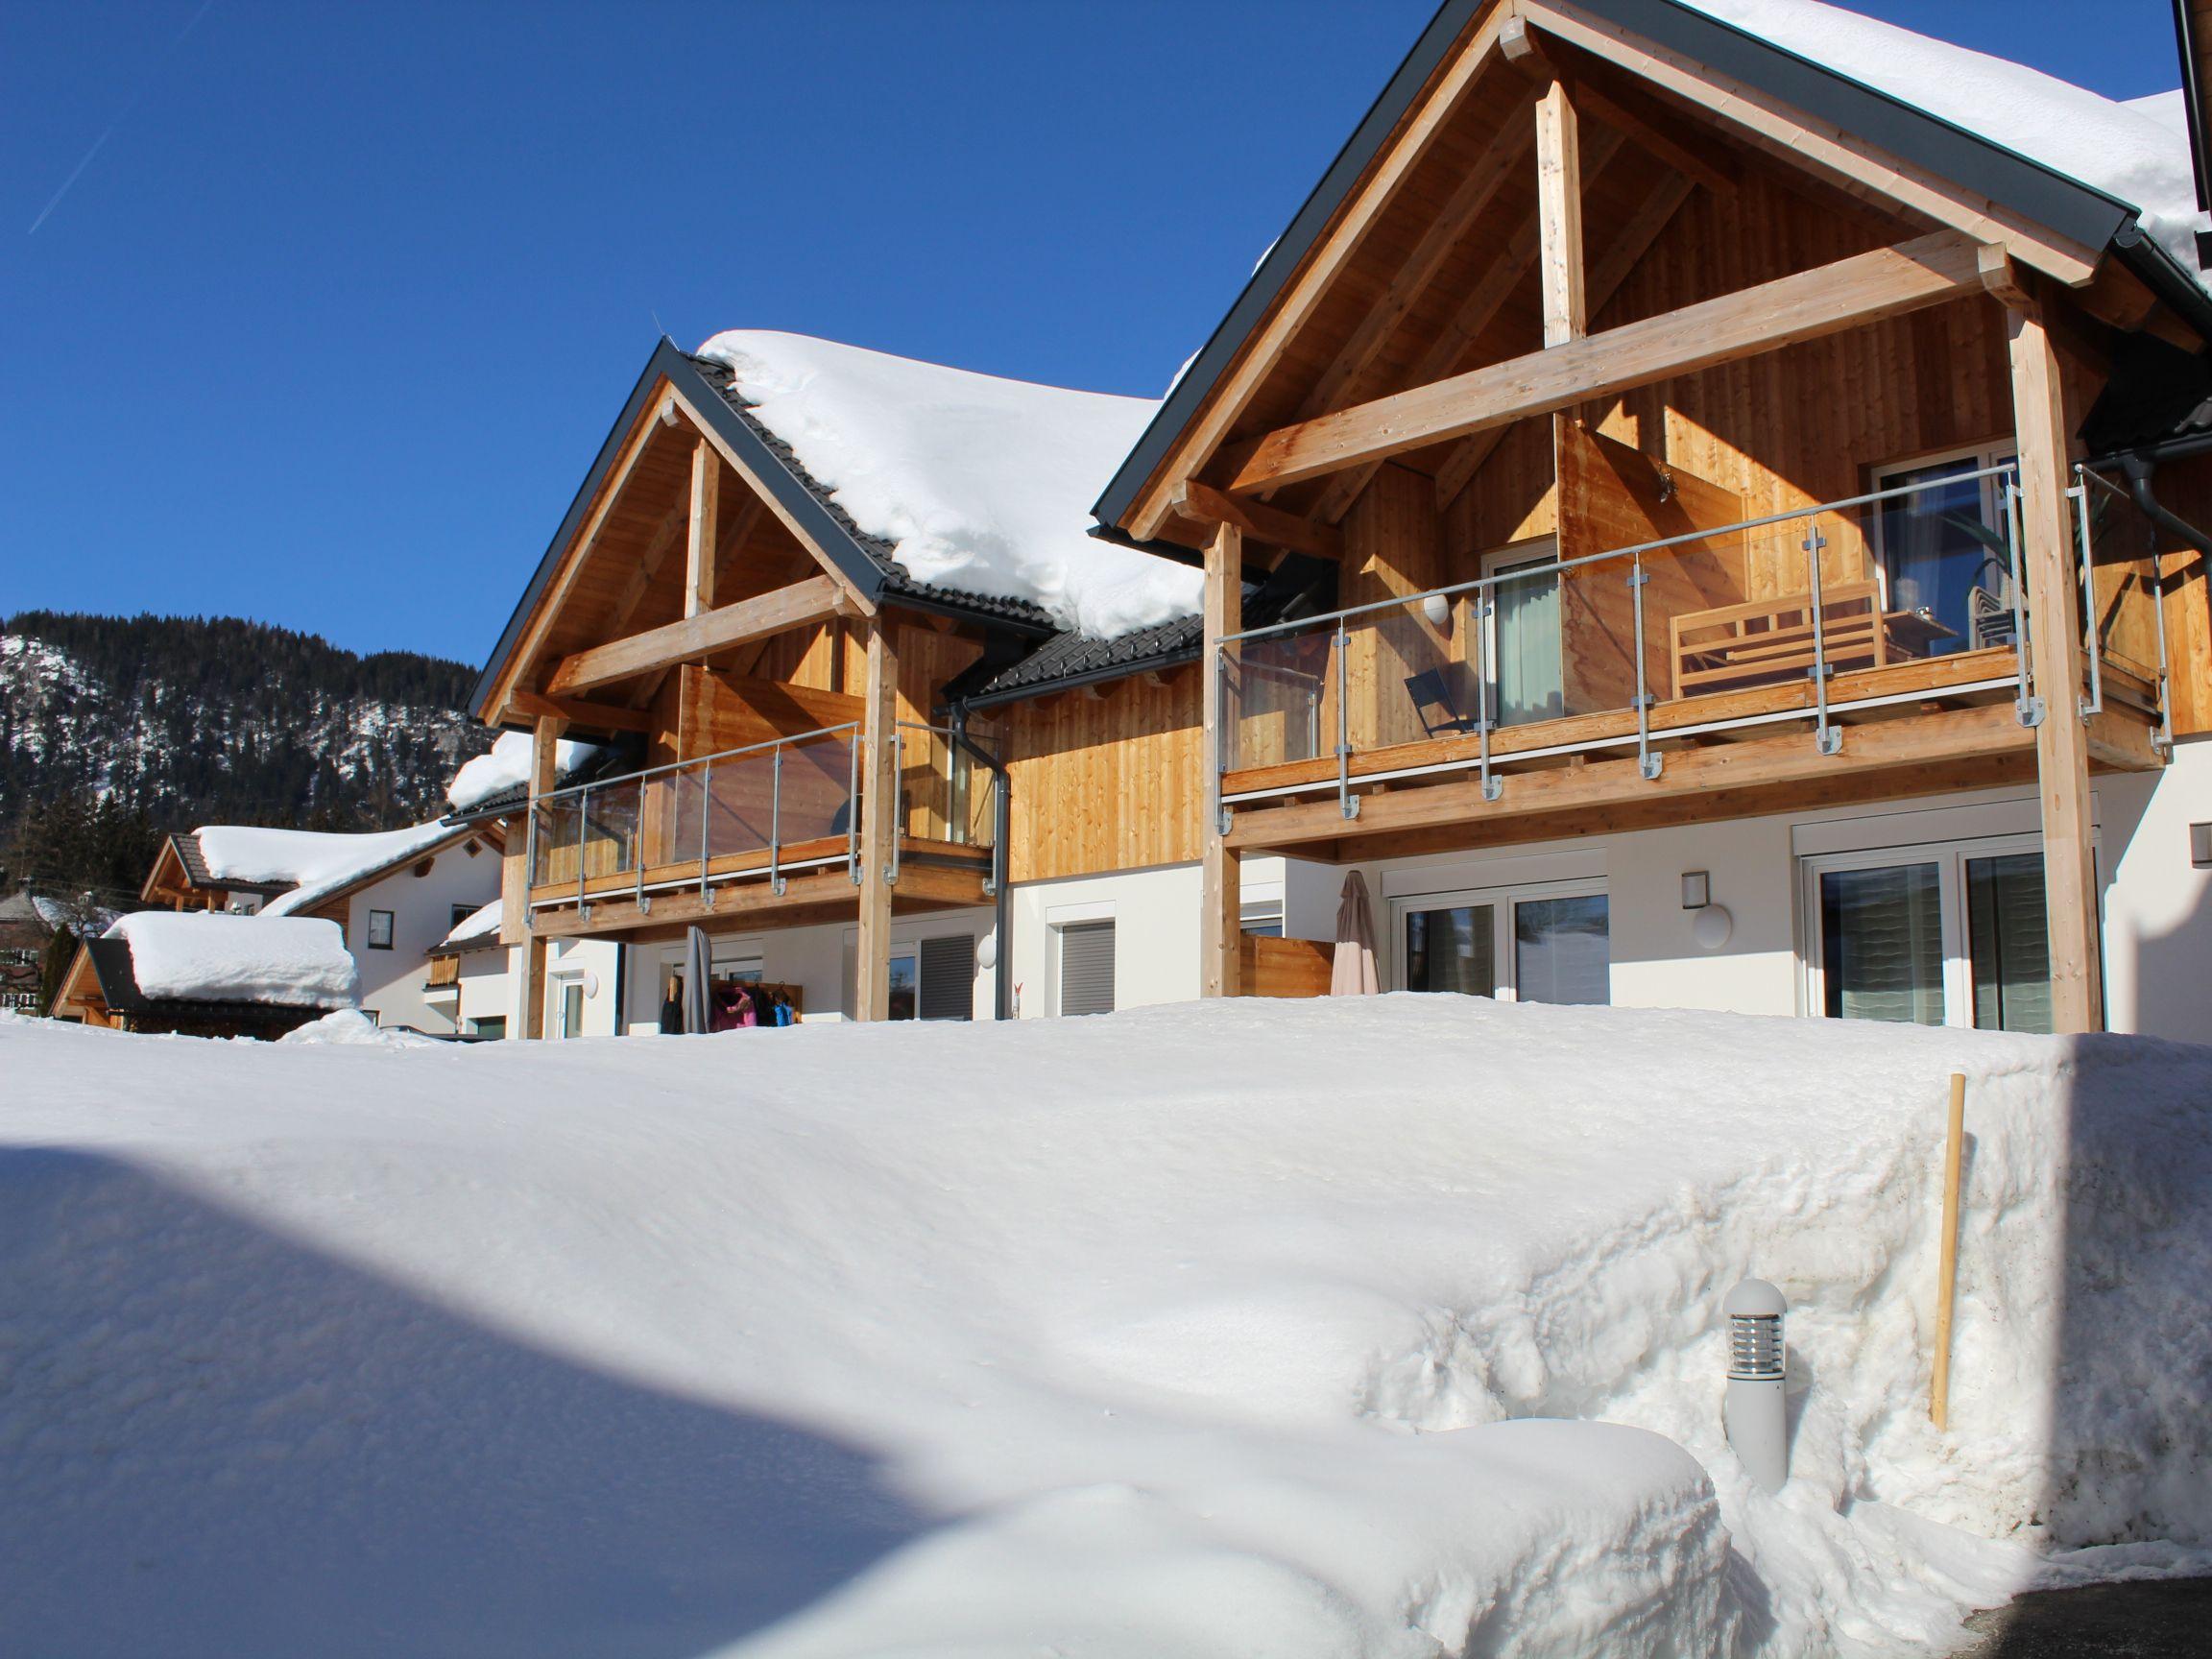 Chalet-appartement Alpine Lisa - 6-7 personen